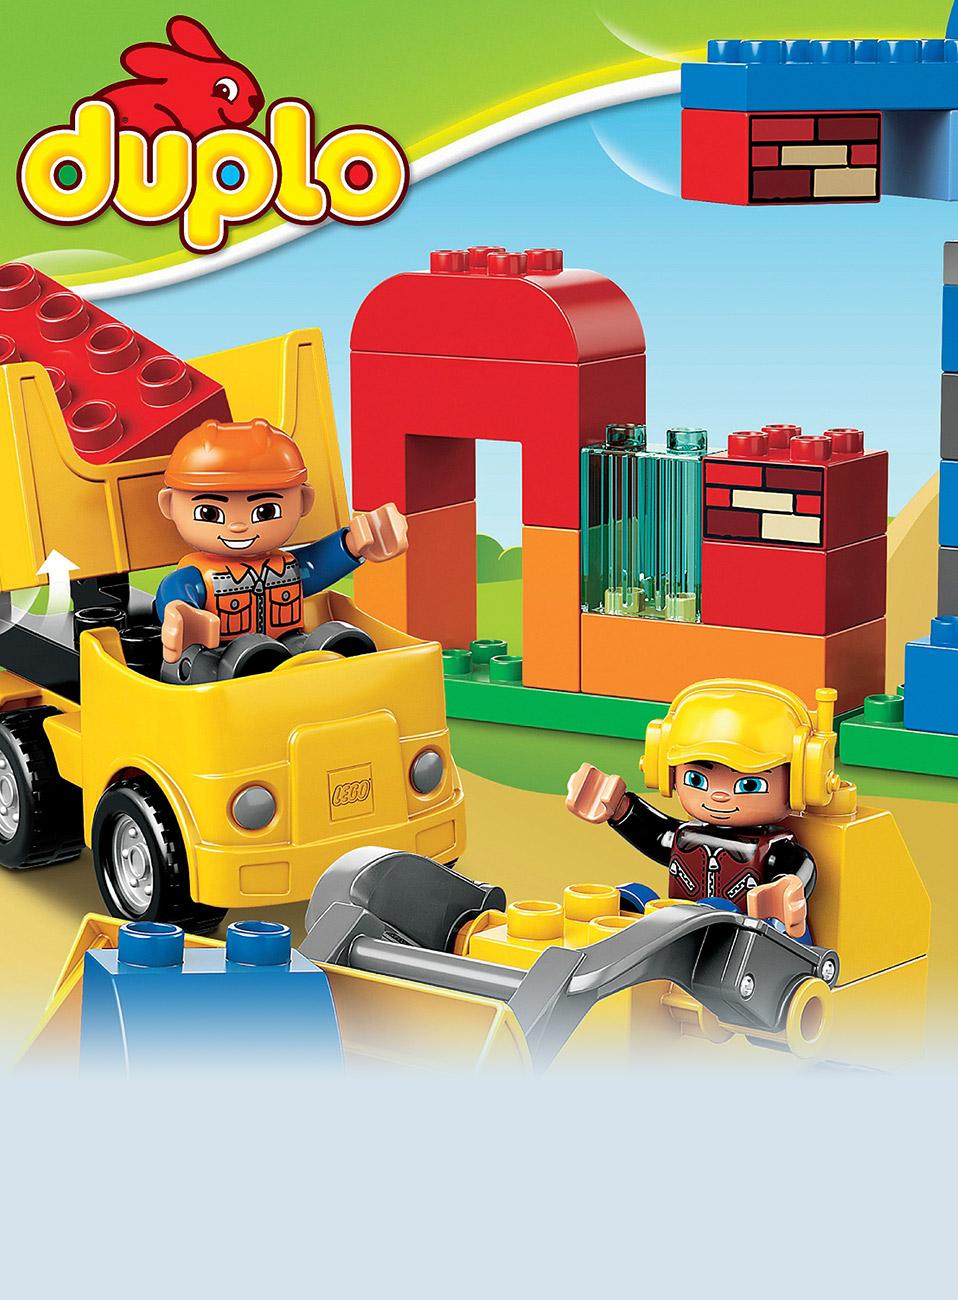 Duplo my first lego lek gadgets for Mobilia webhallen